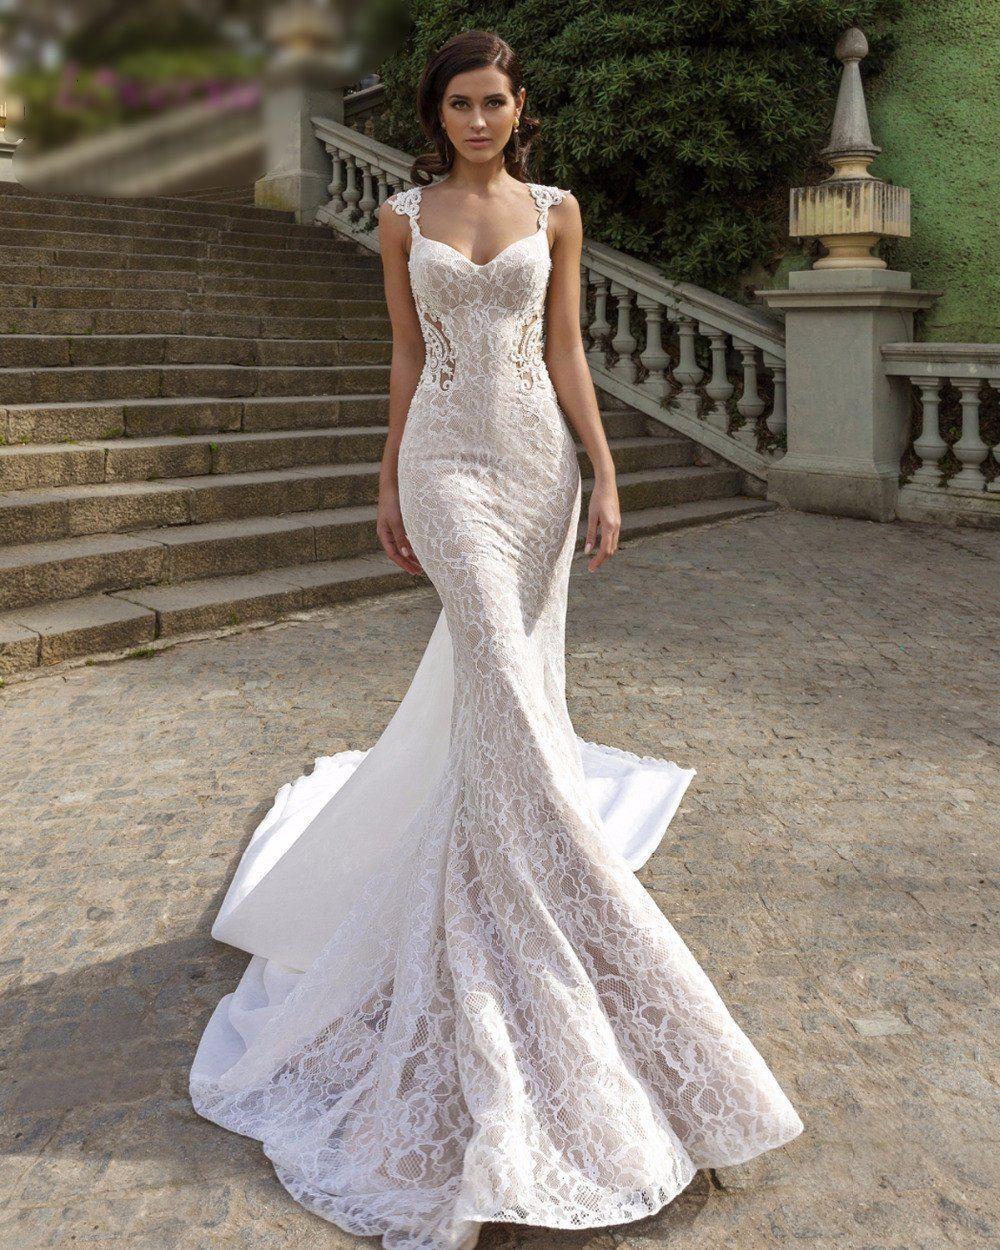 Sweetheart Detachable Train Lace Mermaid Wedding Dresses